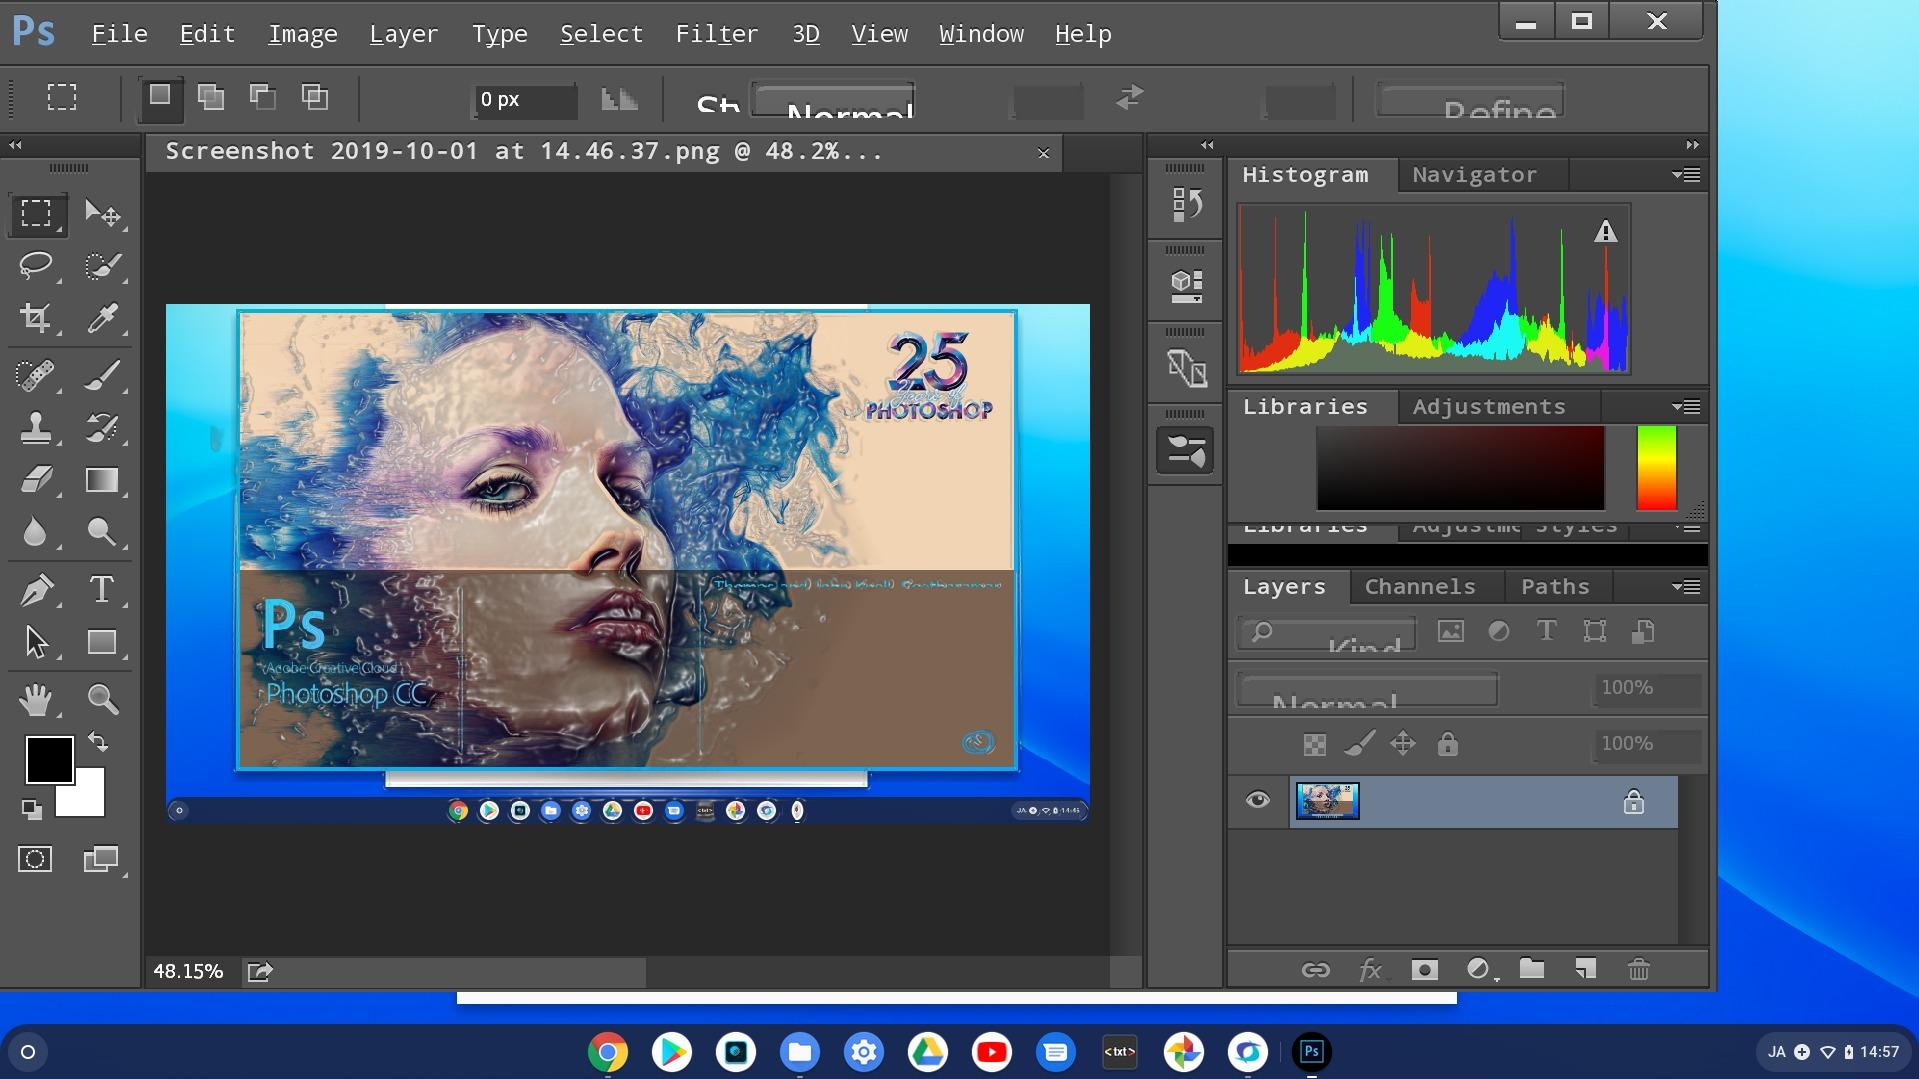 Chromebook CrossOver Photoshop CC 2015 Windows